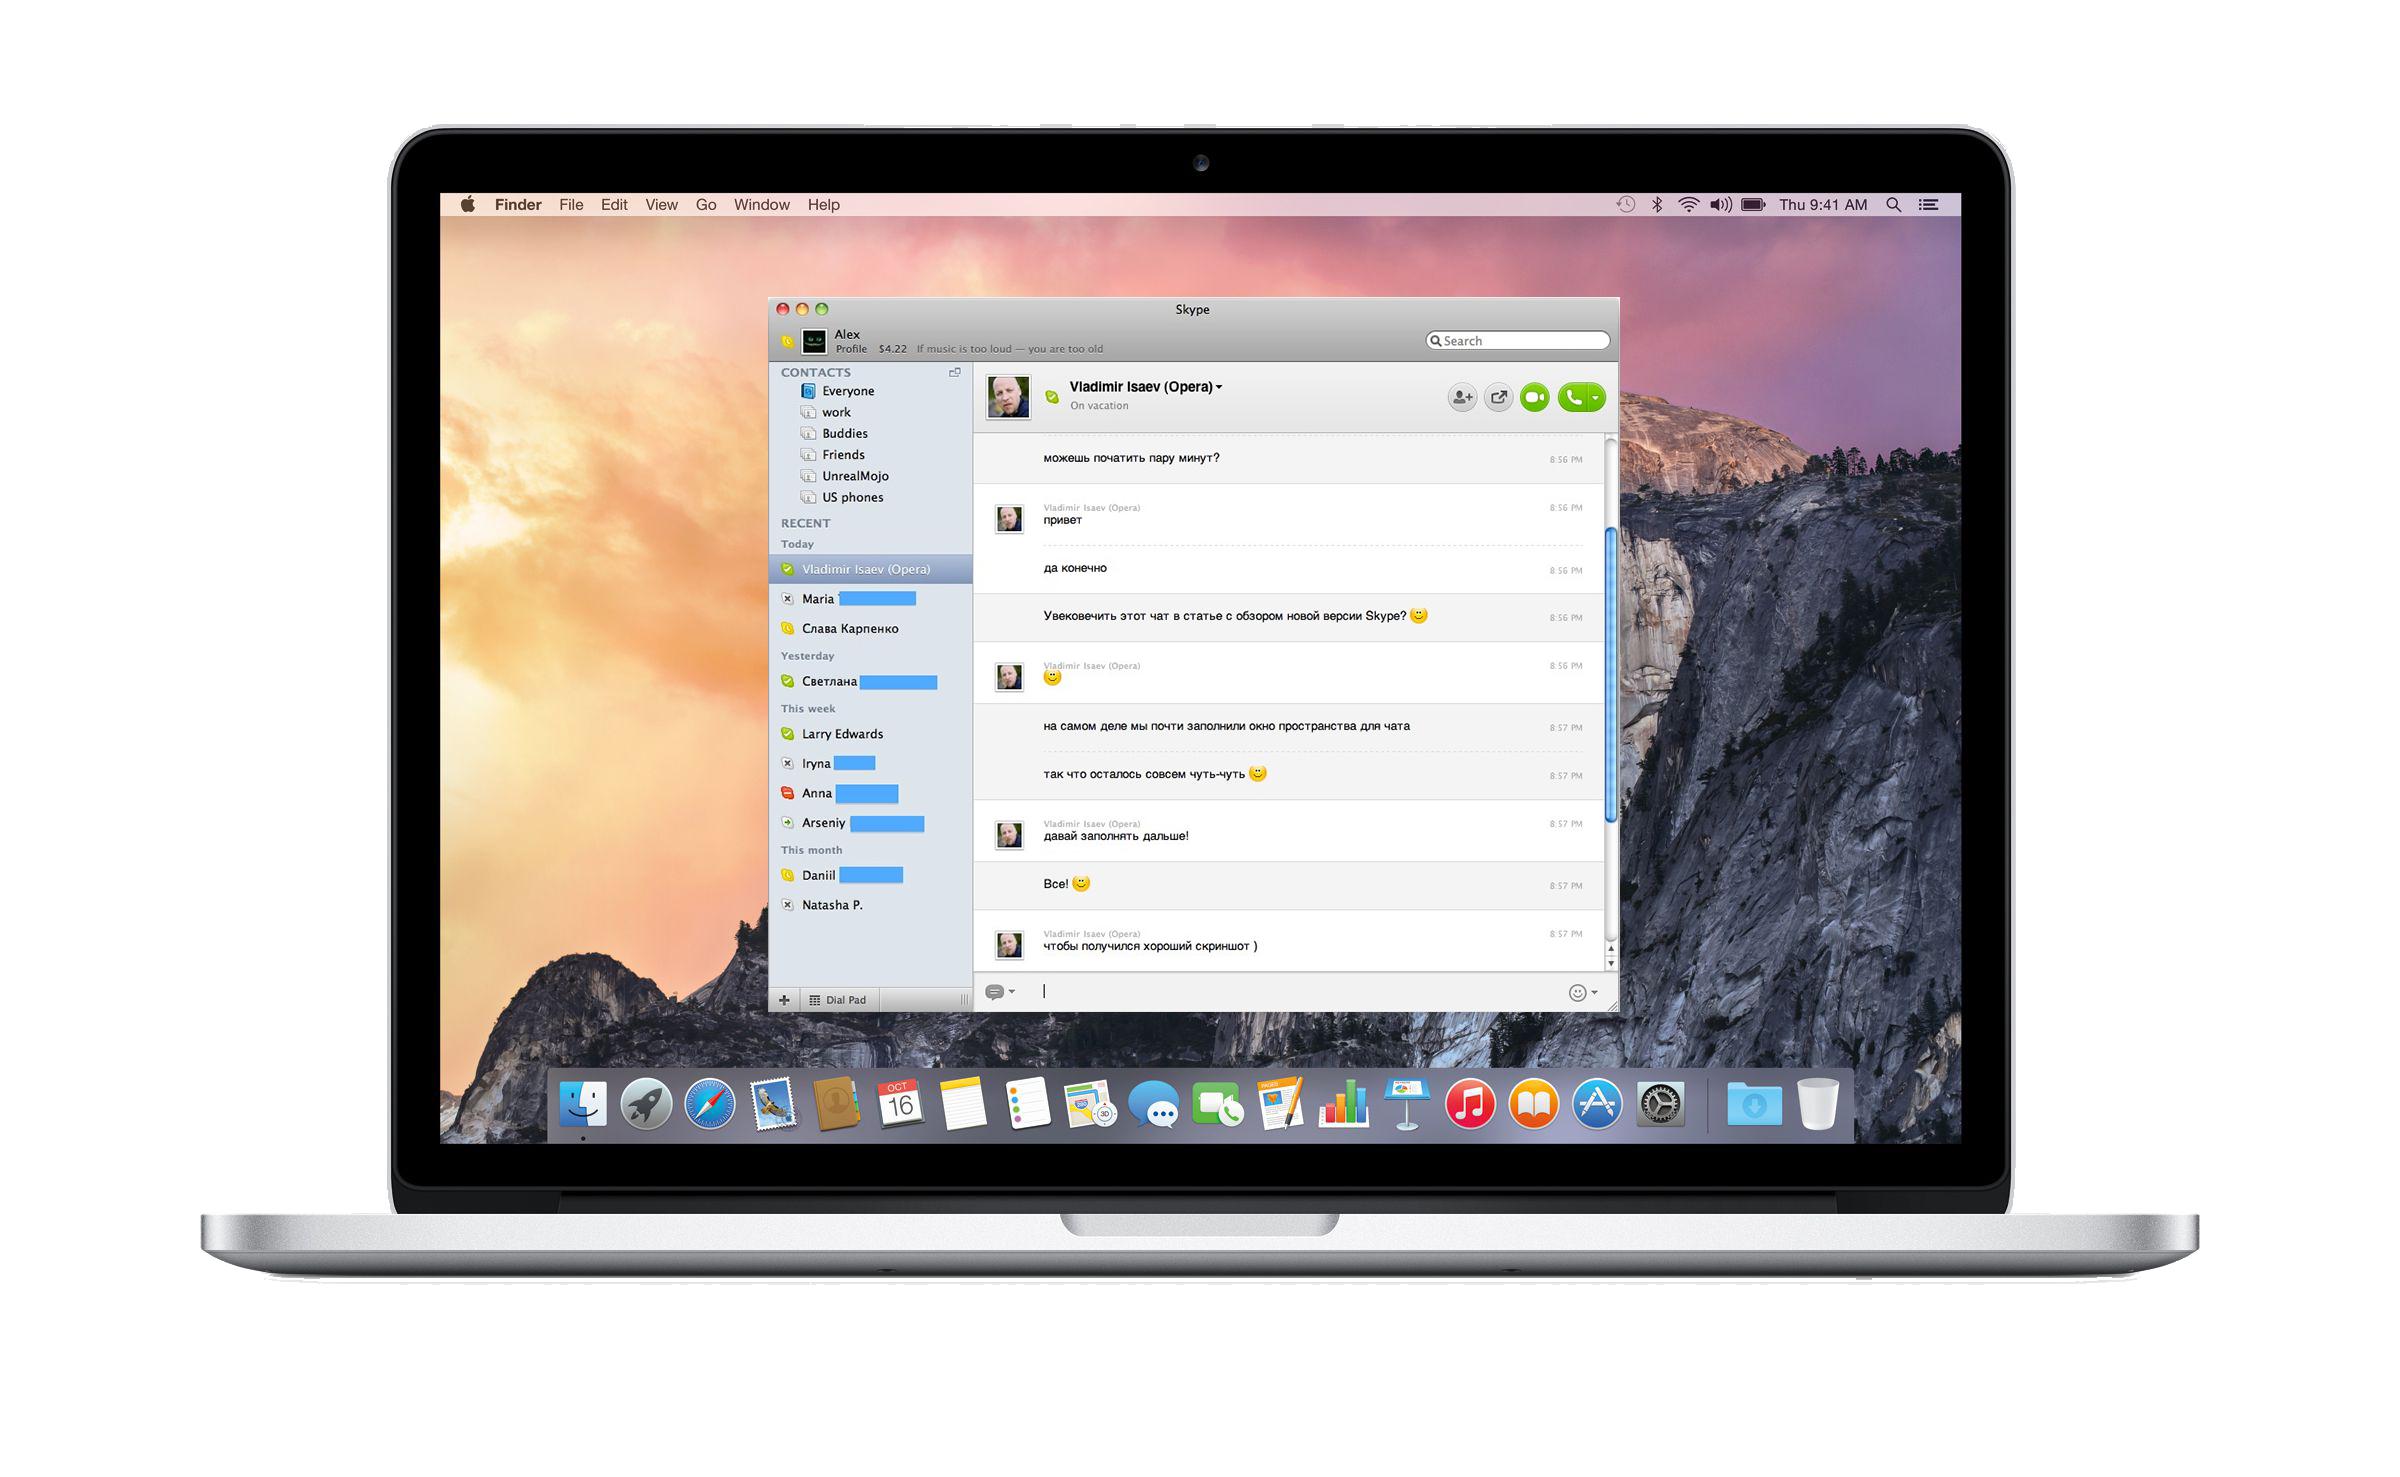 Skype for mac ipad 21.5